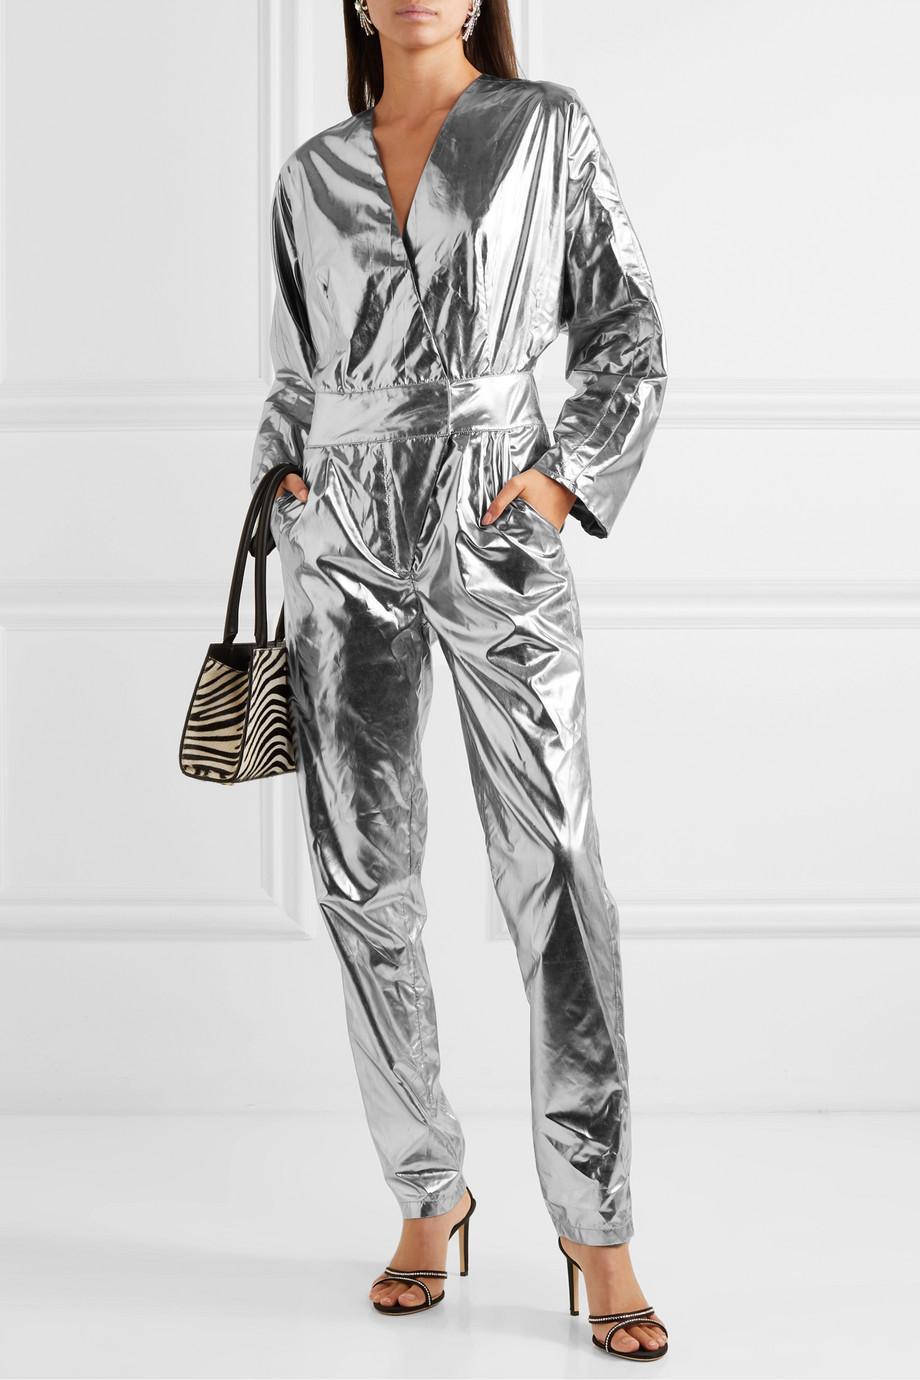 Stand Studio + Pernille Teisbaek Amiya metallic faux leather jumpsuit